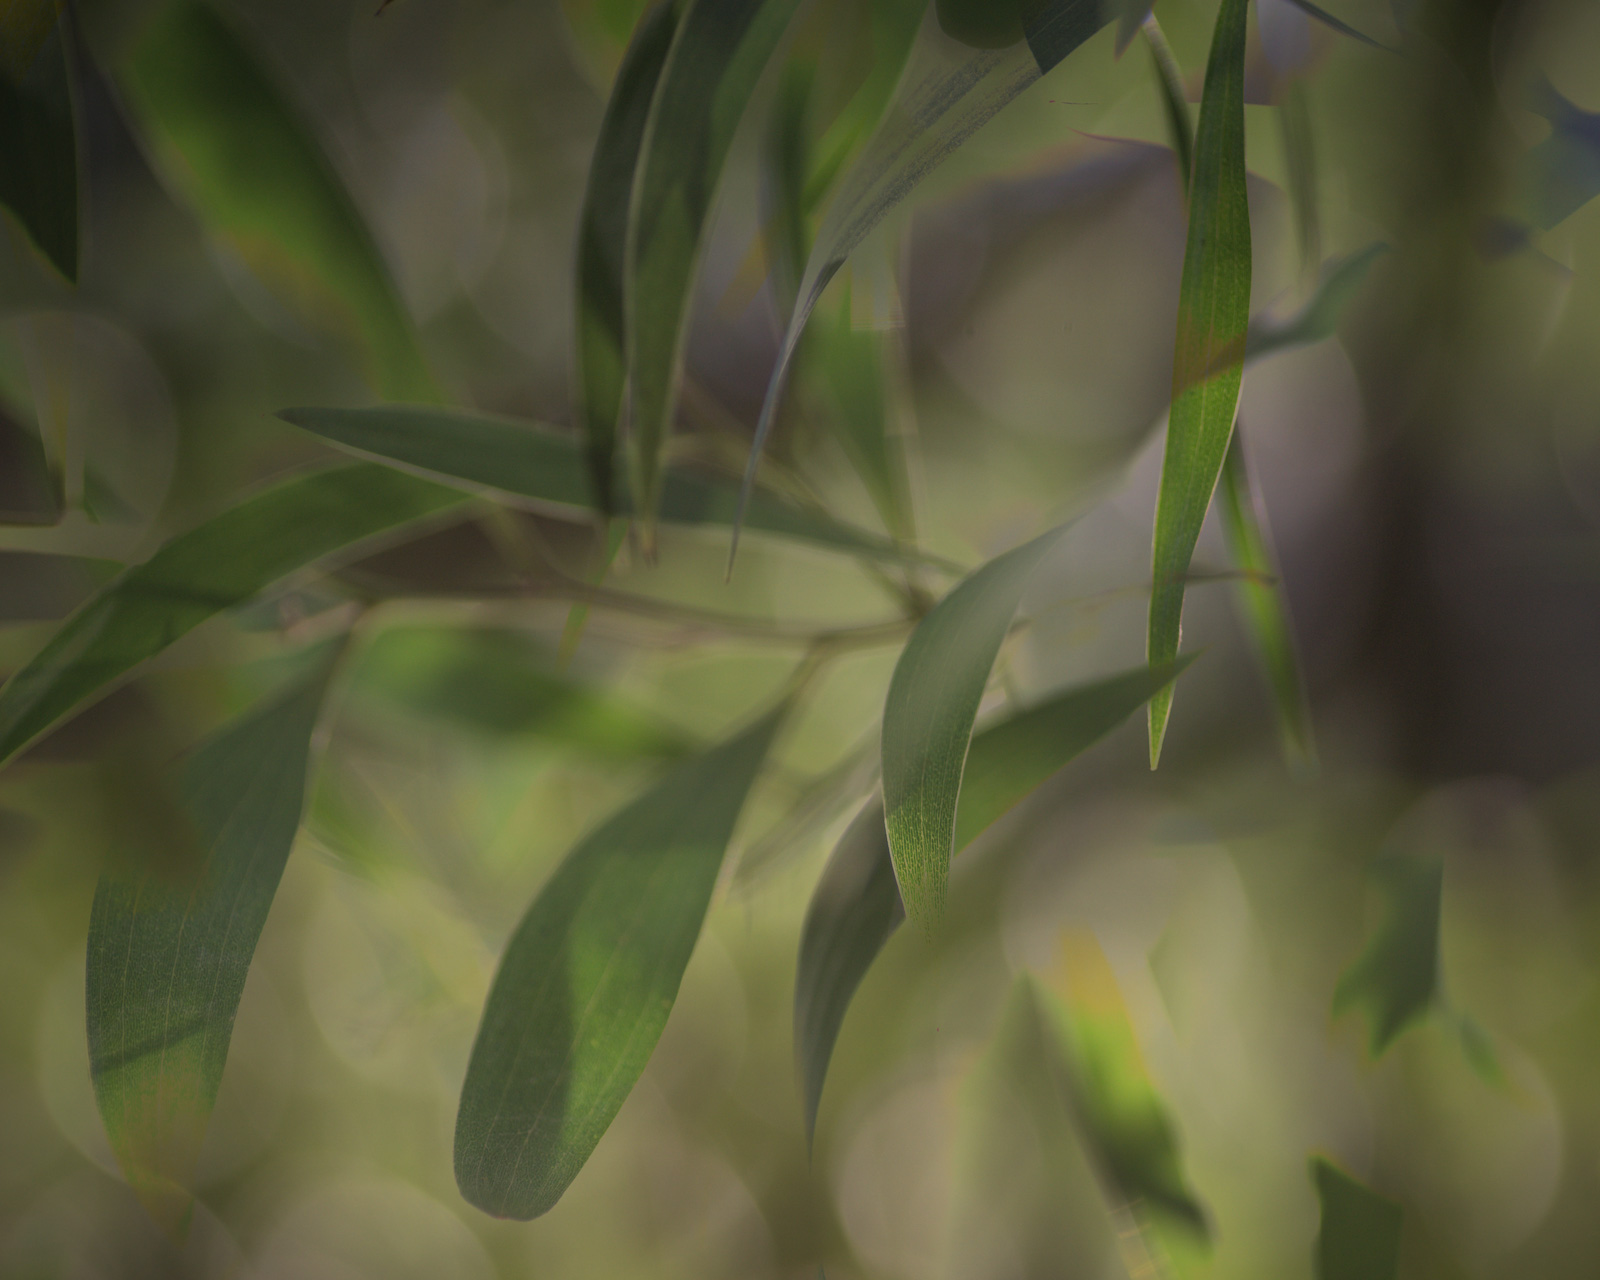 Multiple exposure image created in Photoshop using 'darken' blend mode